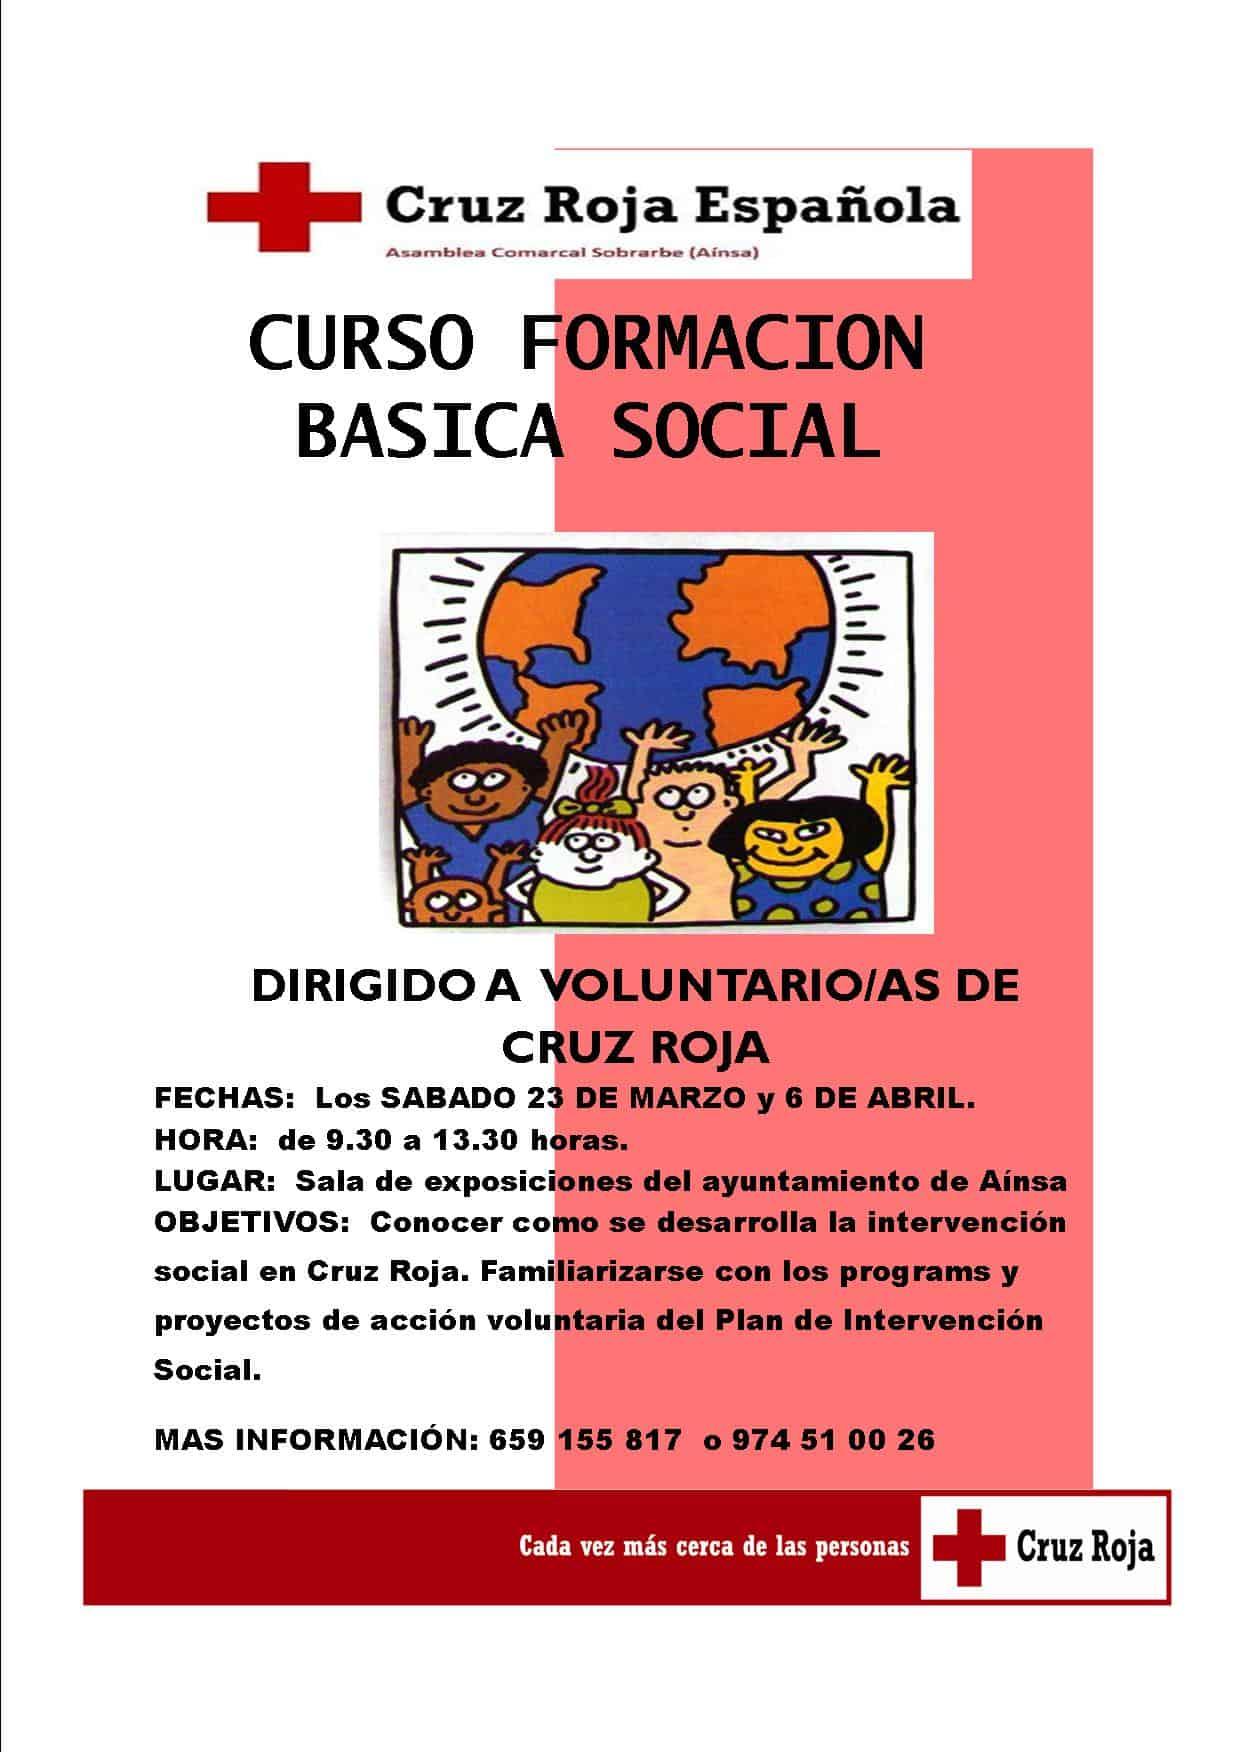 cartel_basica_social.jpg